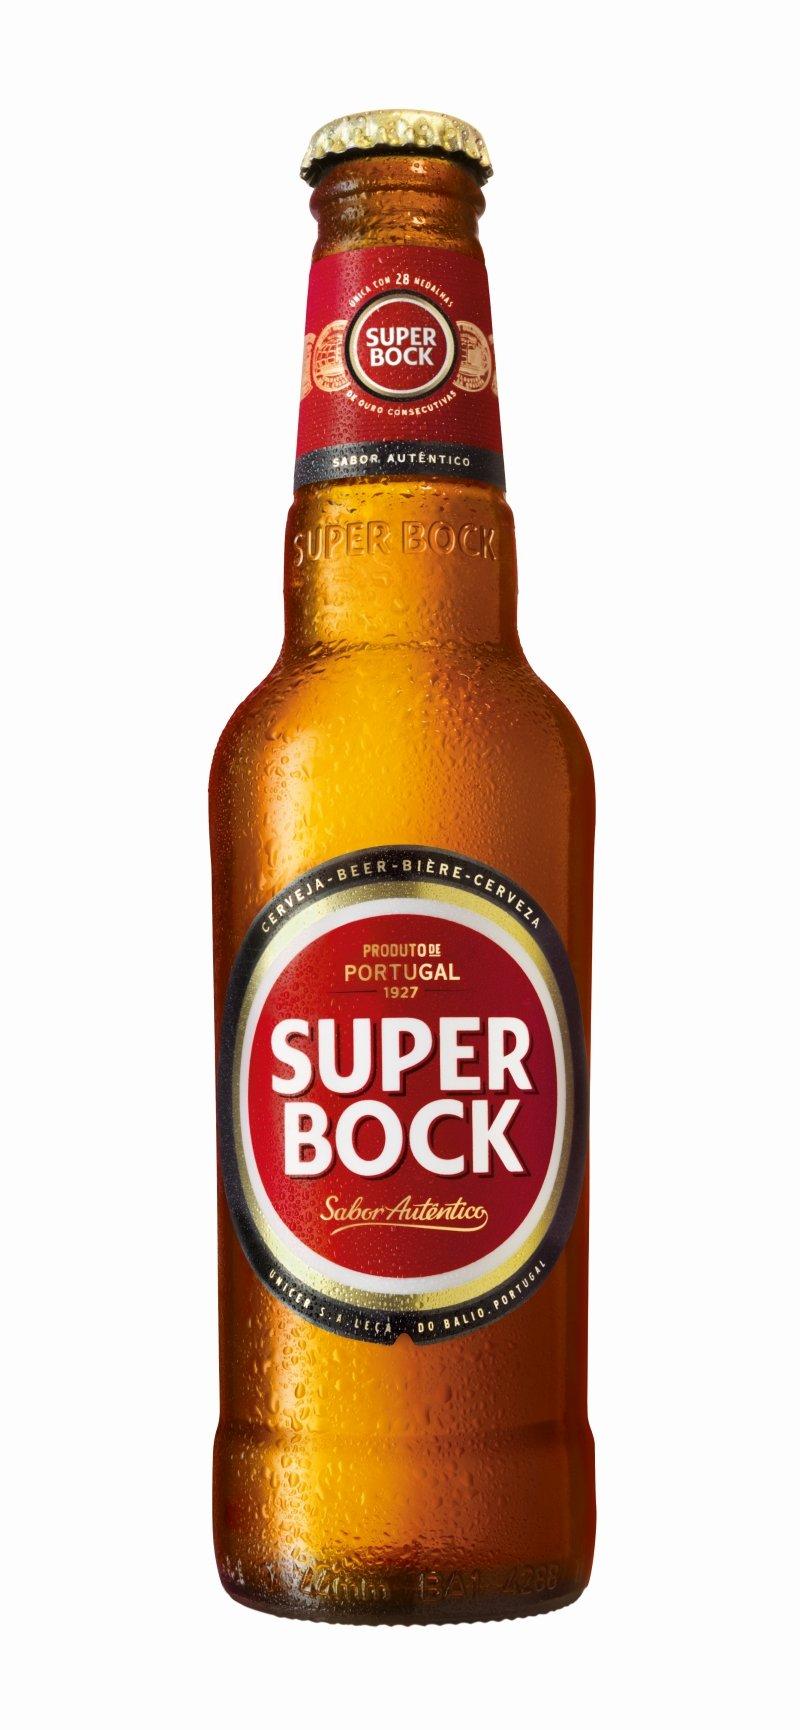 Super Bock Group distinguido no Monde Selection 2019